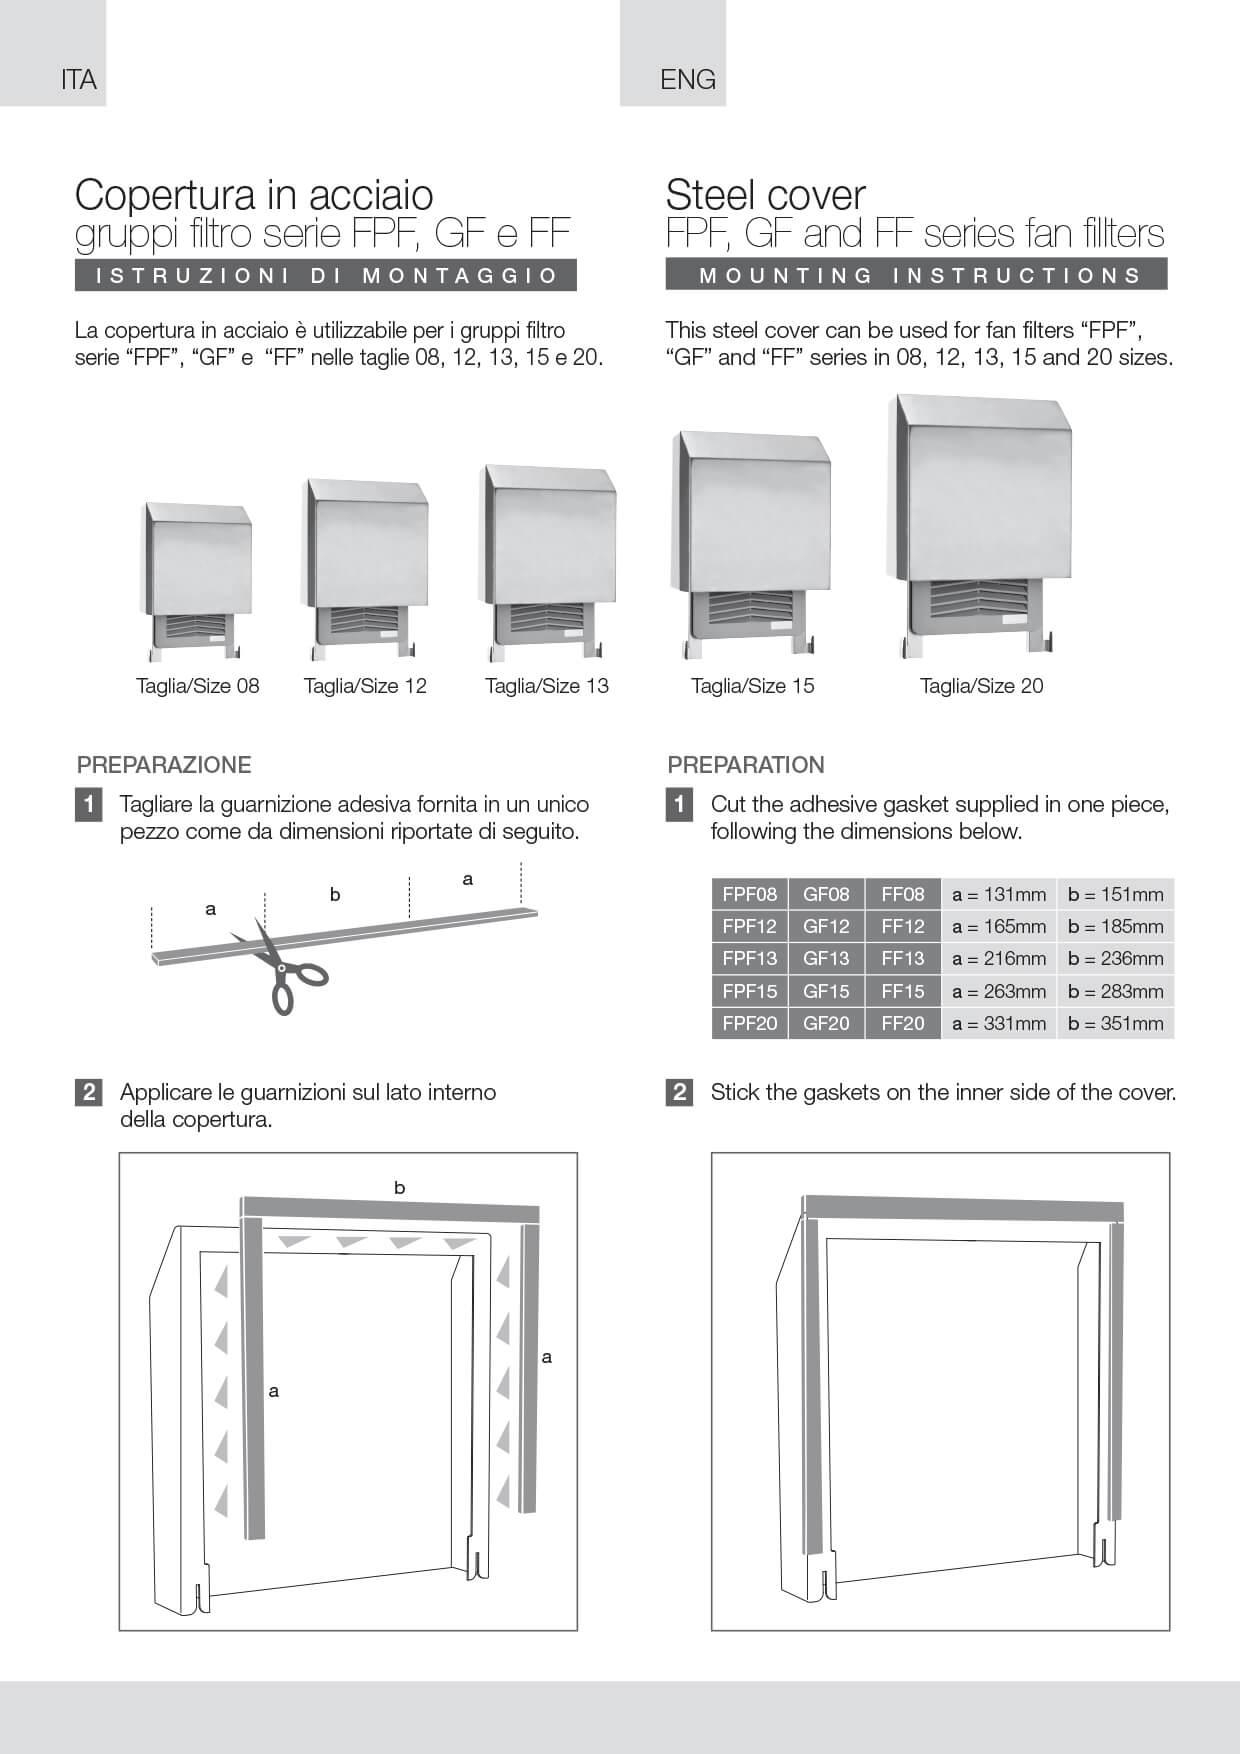 Filter fans hose proof hood SSC instructions